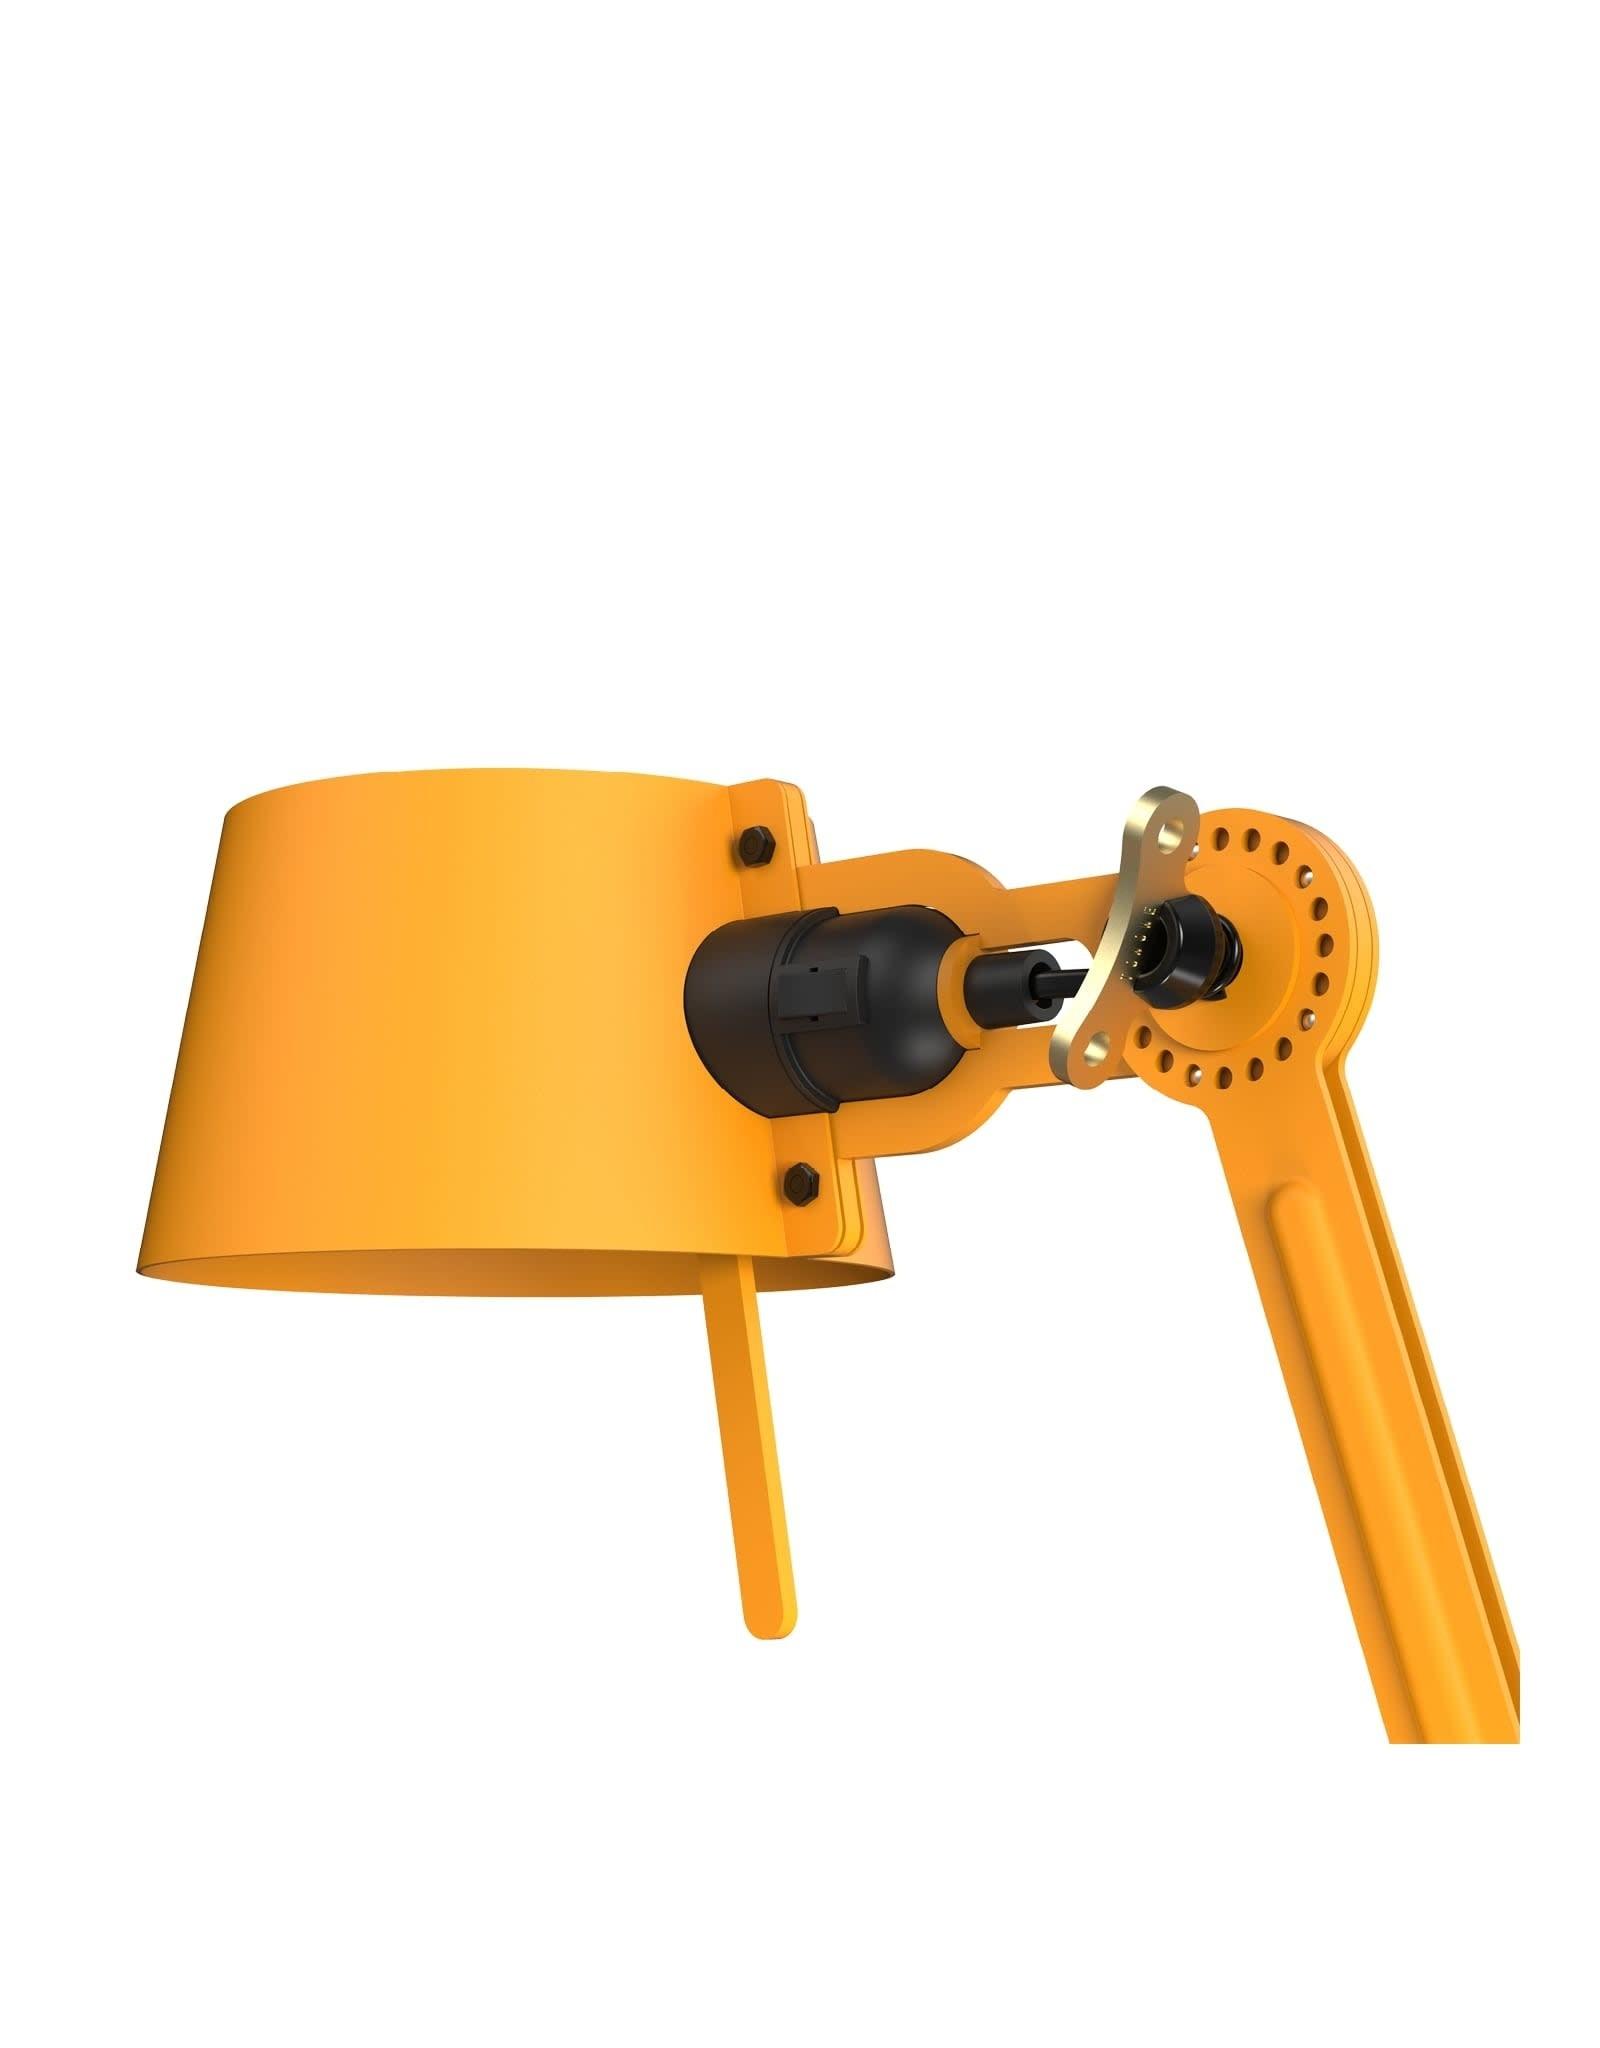 TONONE BOLT  Desk Small 2 Arm Foot Sunny Yellow